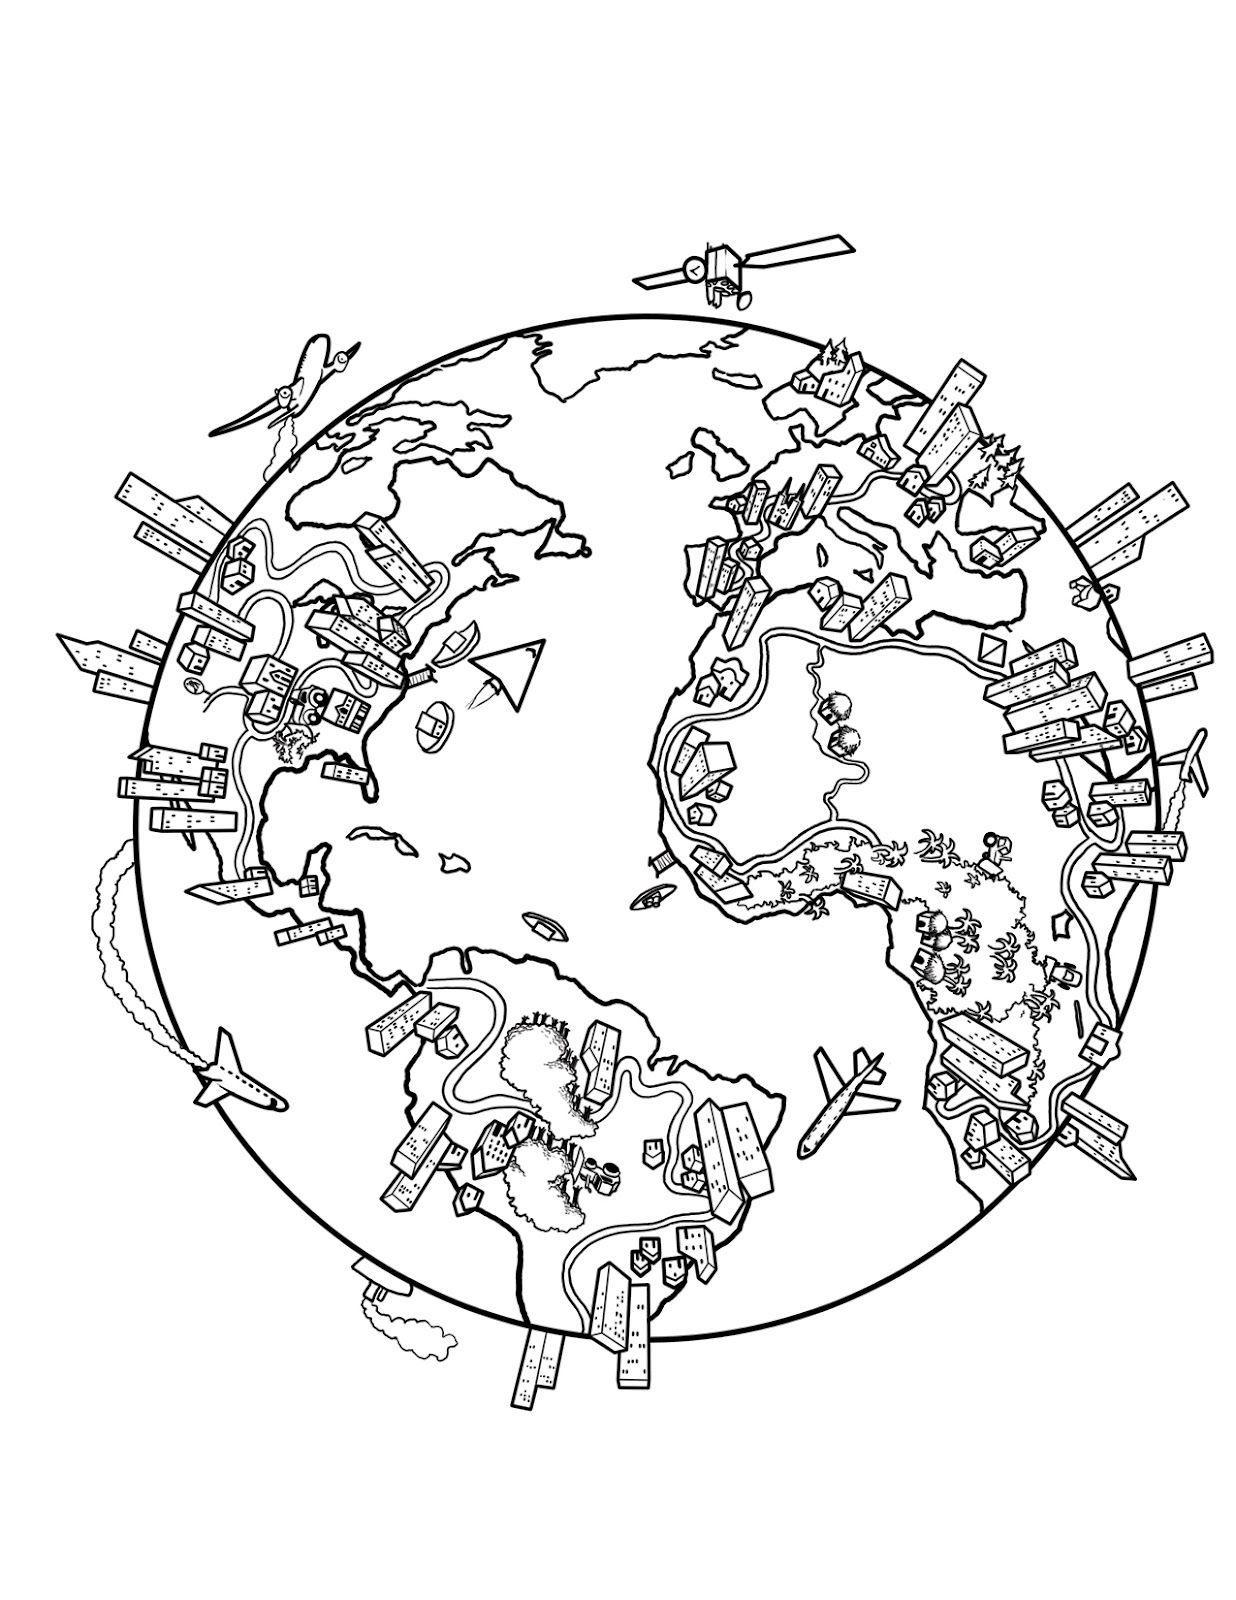 http://zidoshop.com/wp-content/uploads/20/20/map-the-world